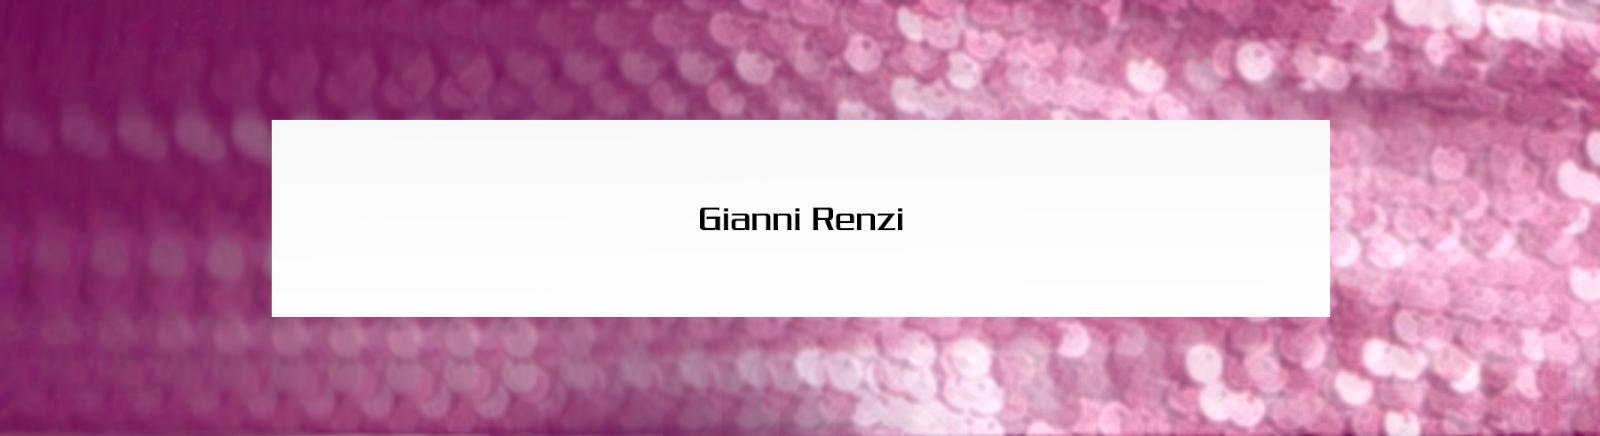 Gianni Renzi Herrenschuhe online entdecken im Juppen Shop